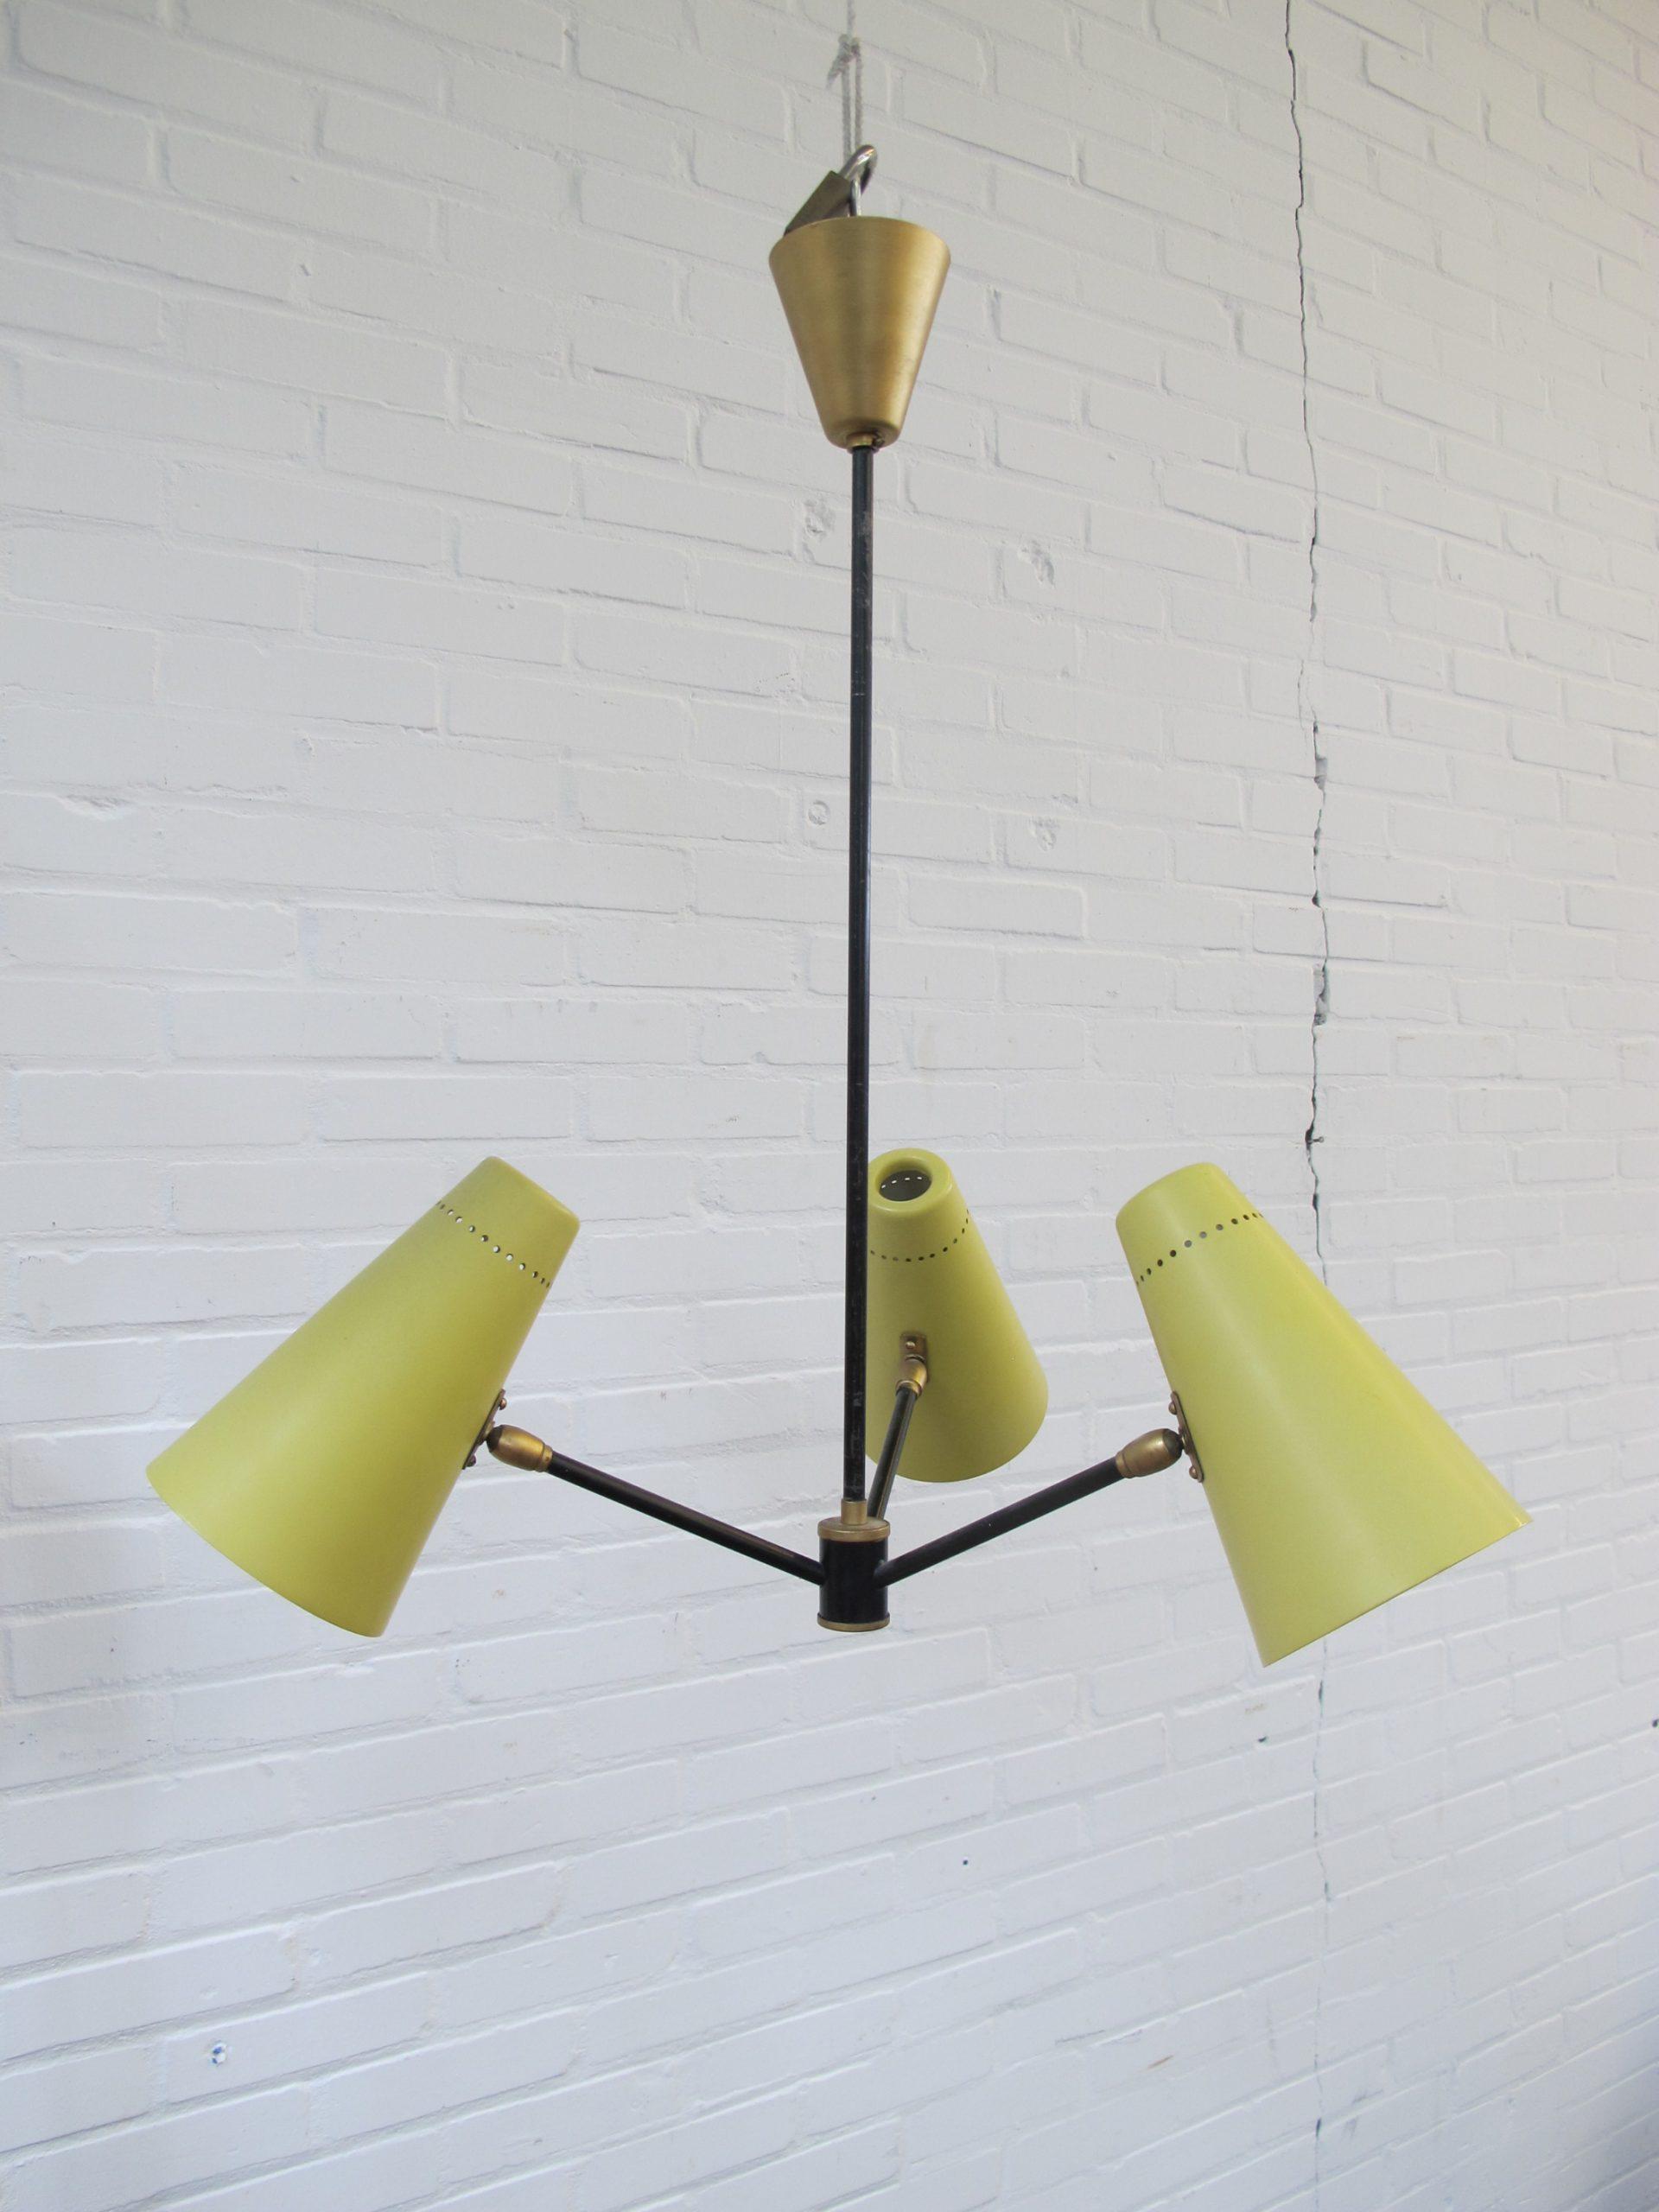 Lamp hanglamp Fog & Mørup hanging lamp vintage midcentury